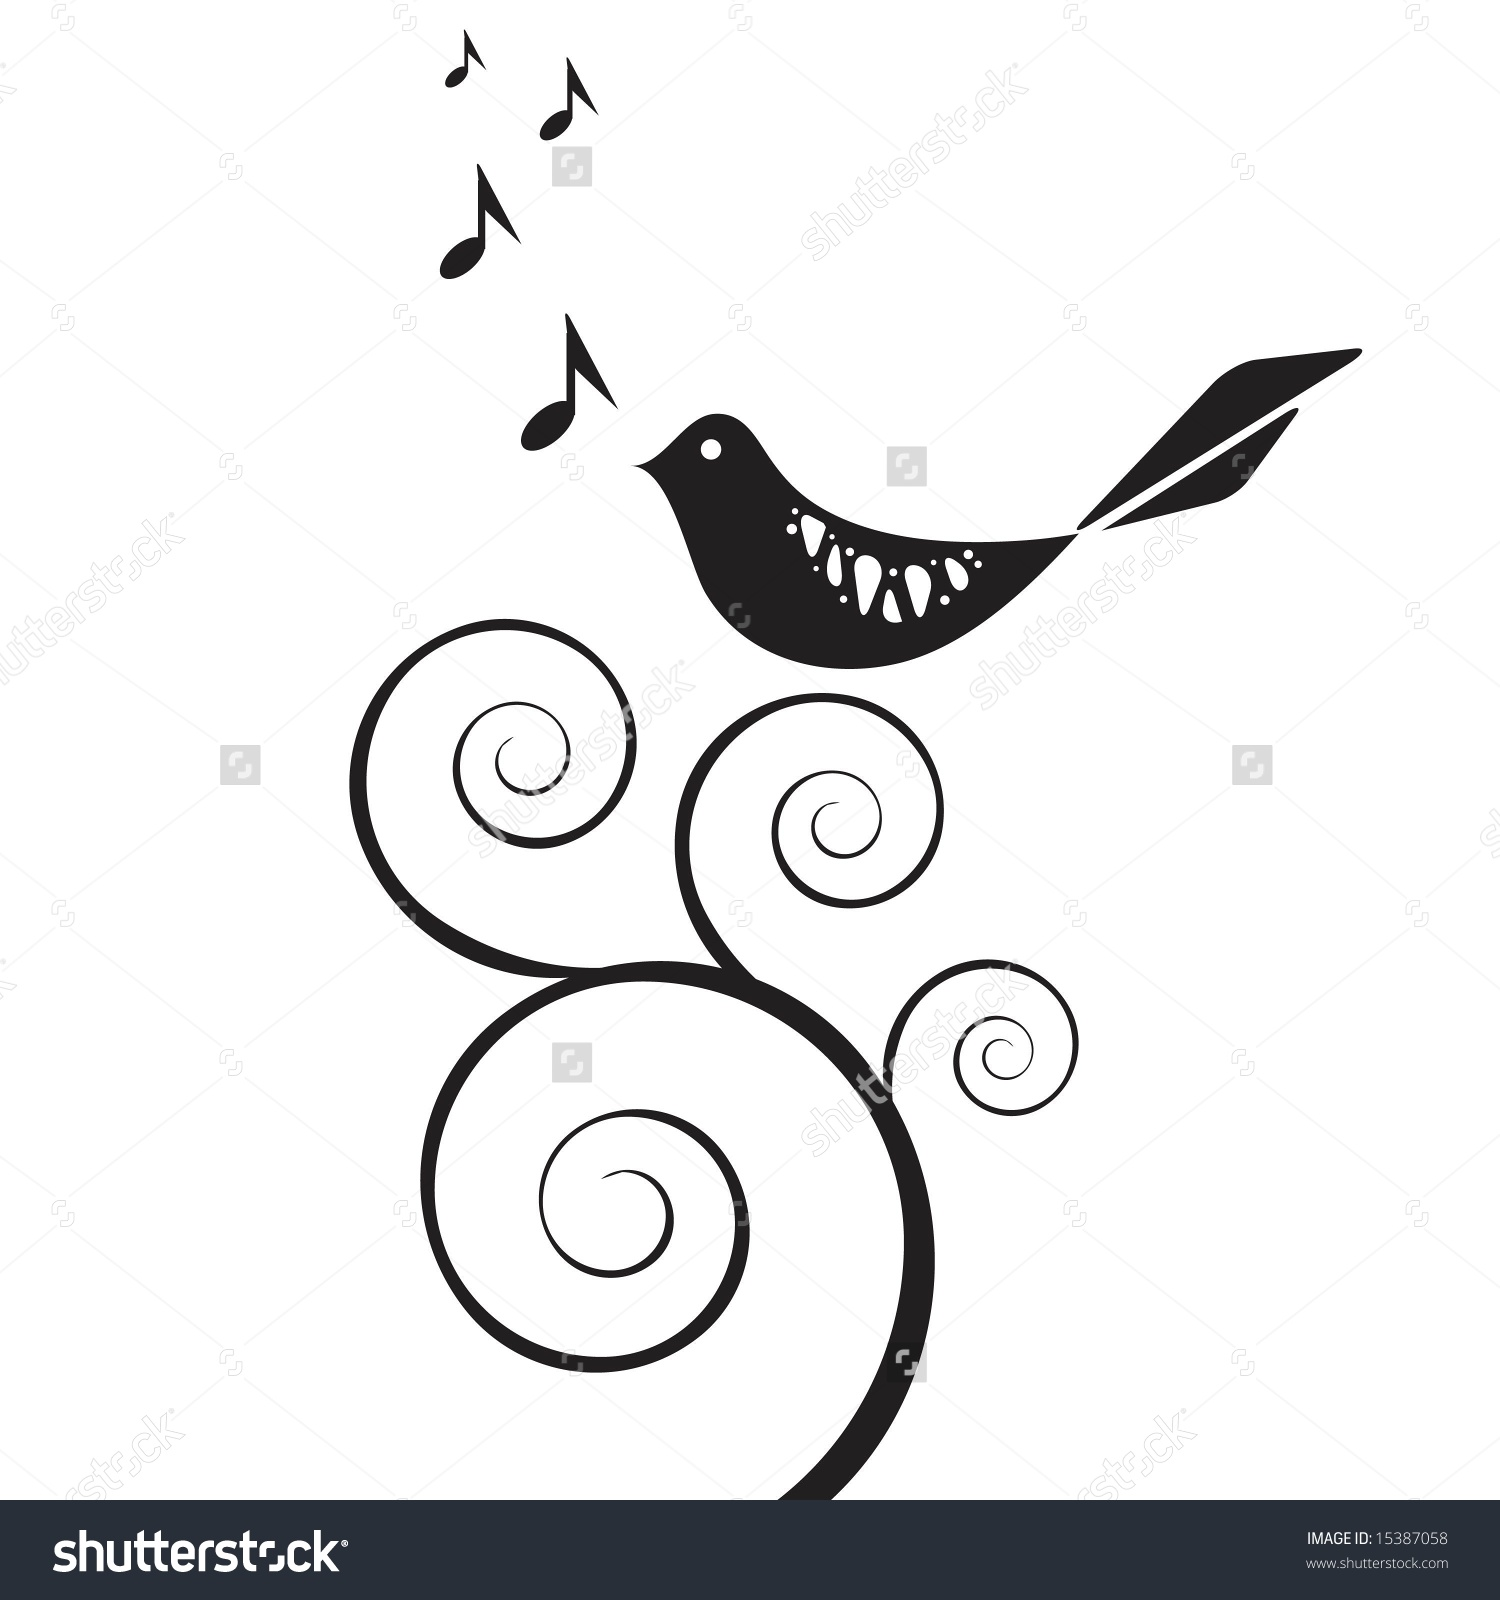 Songbird Clip Art.